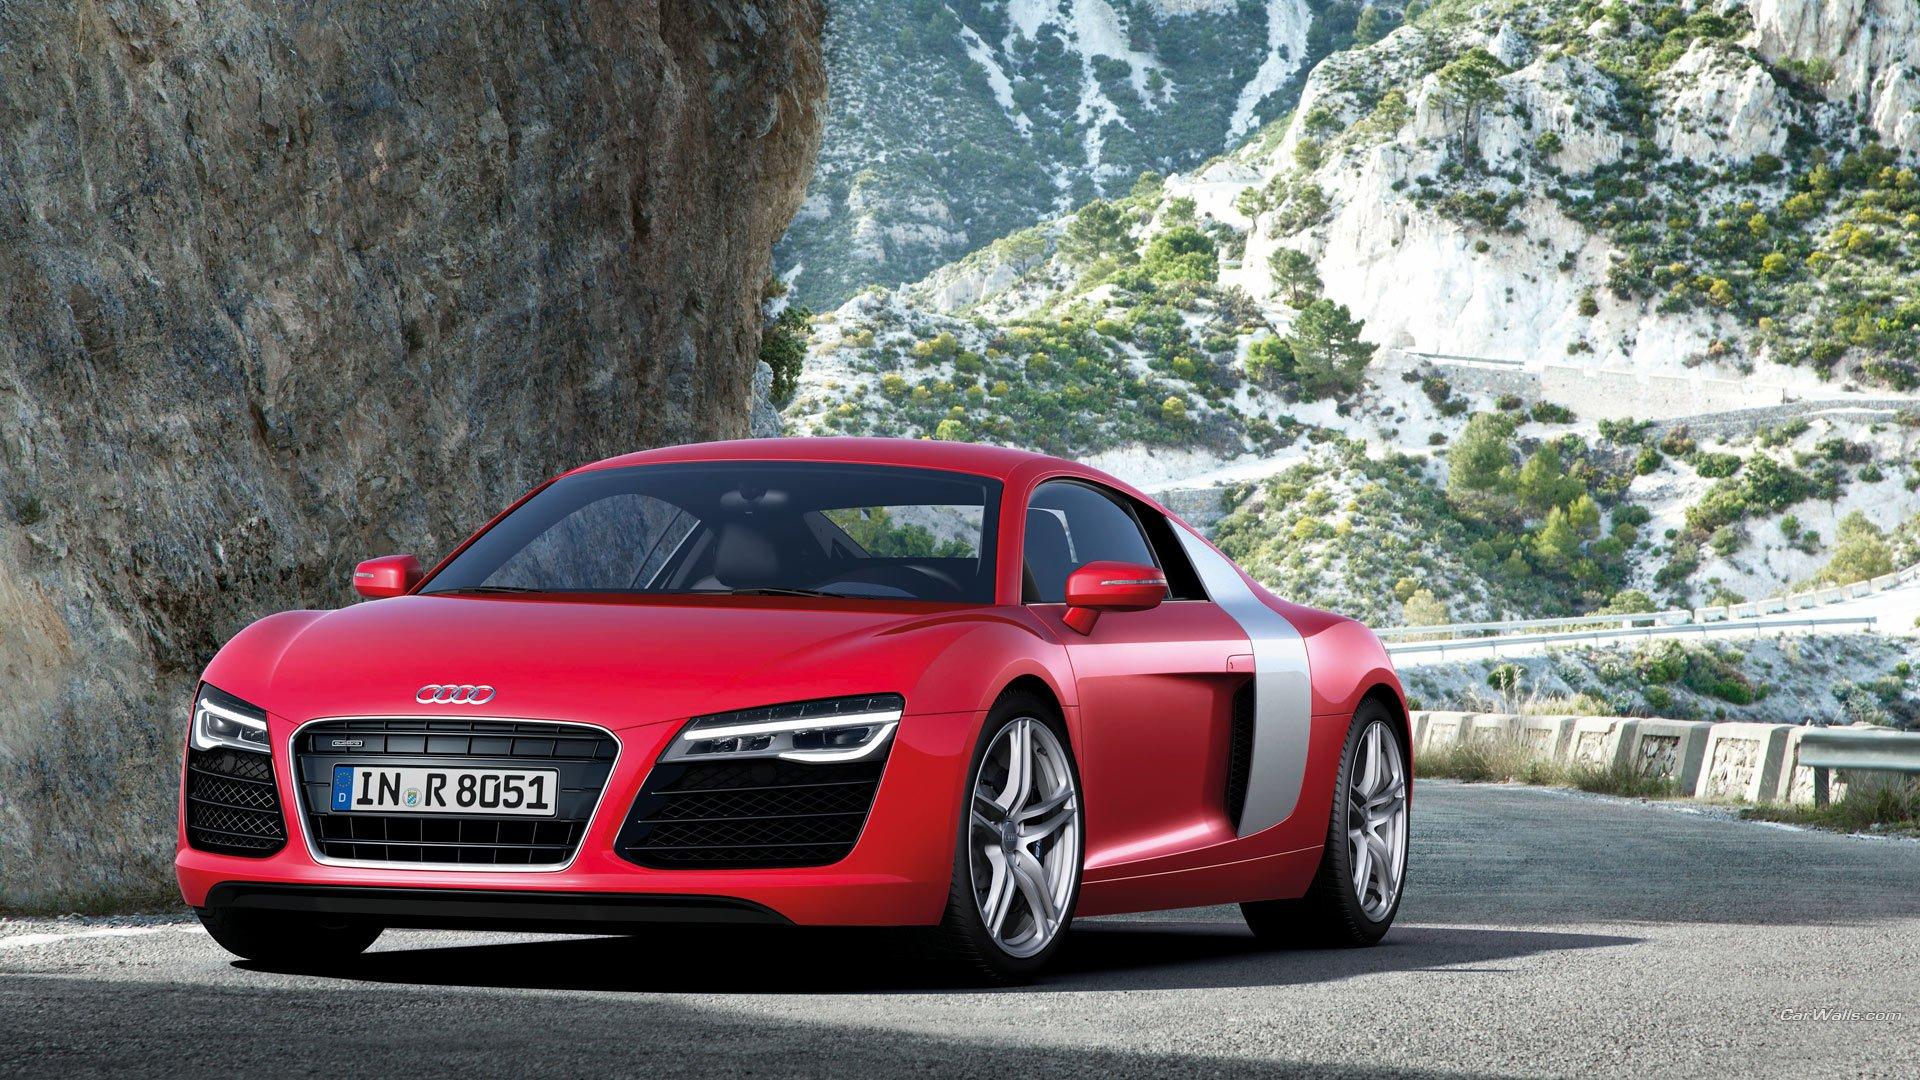 Vehicles - Audi R8  Audi Supercar Car Red Car Vehicle Wallpaper